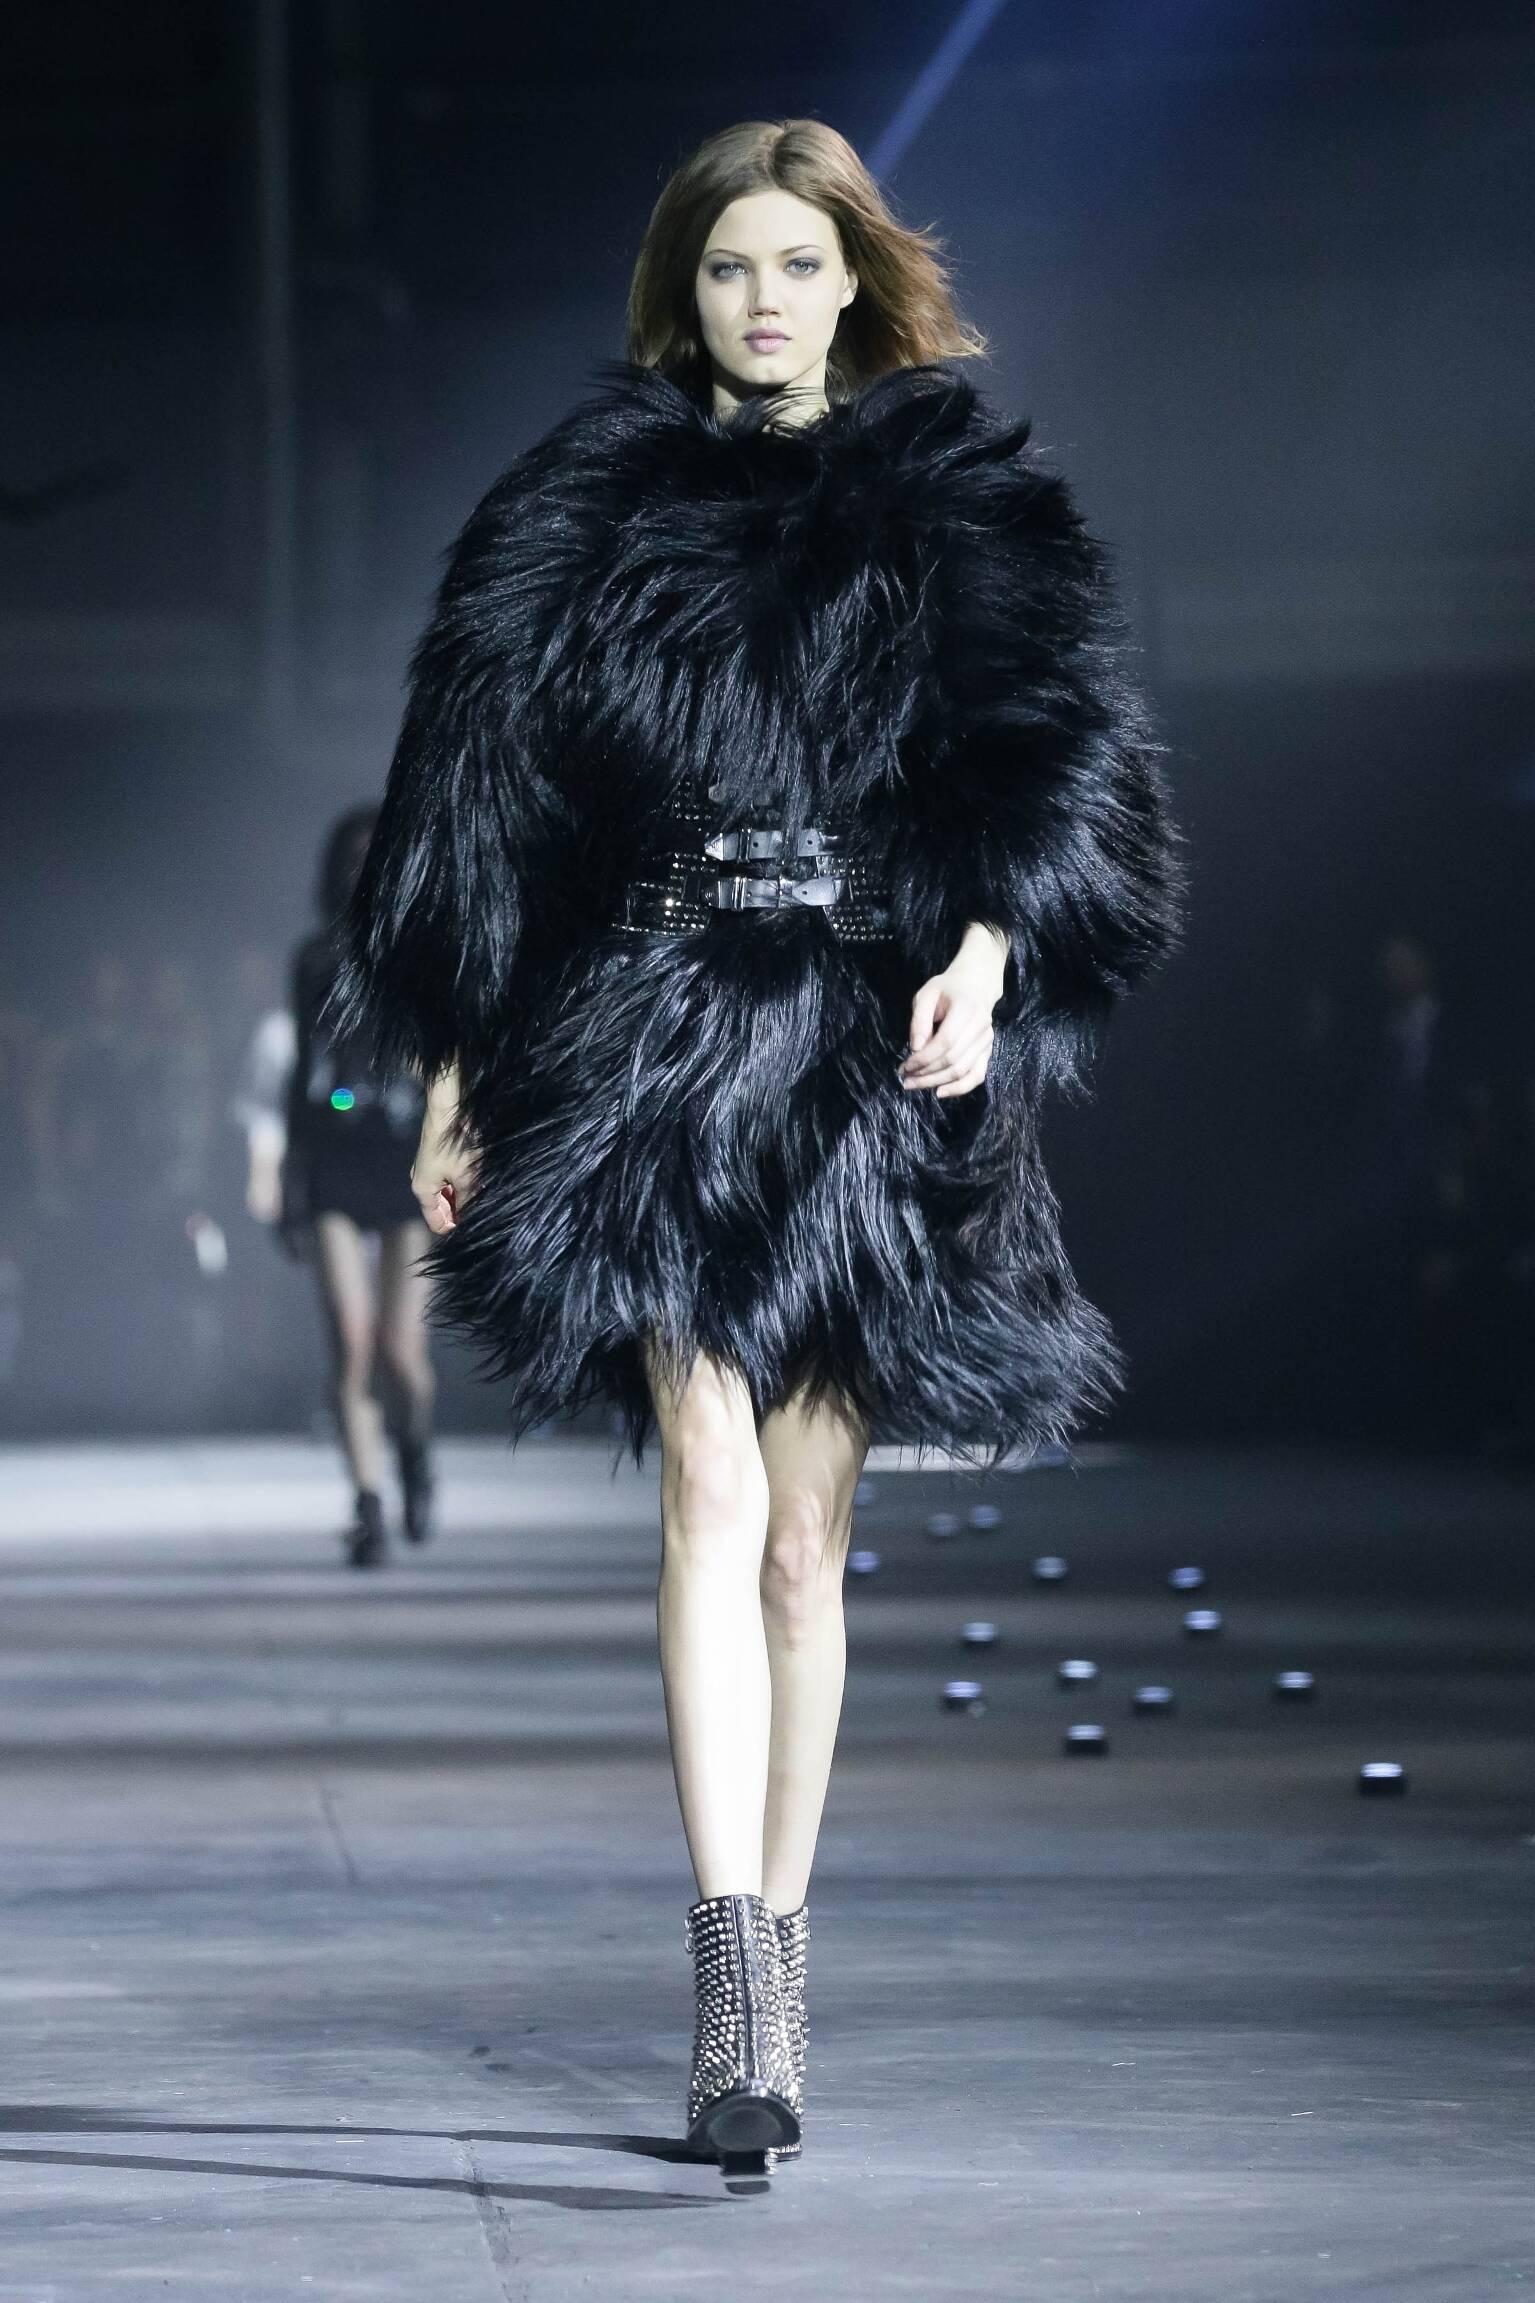 Philipp Plein Fall Winter 2015 16 Women's Collection Milan Fashion Week